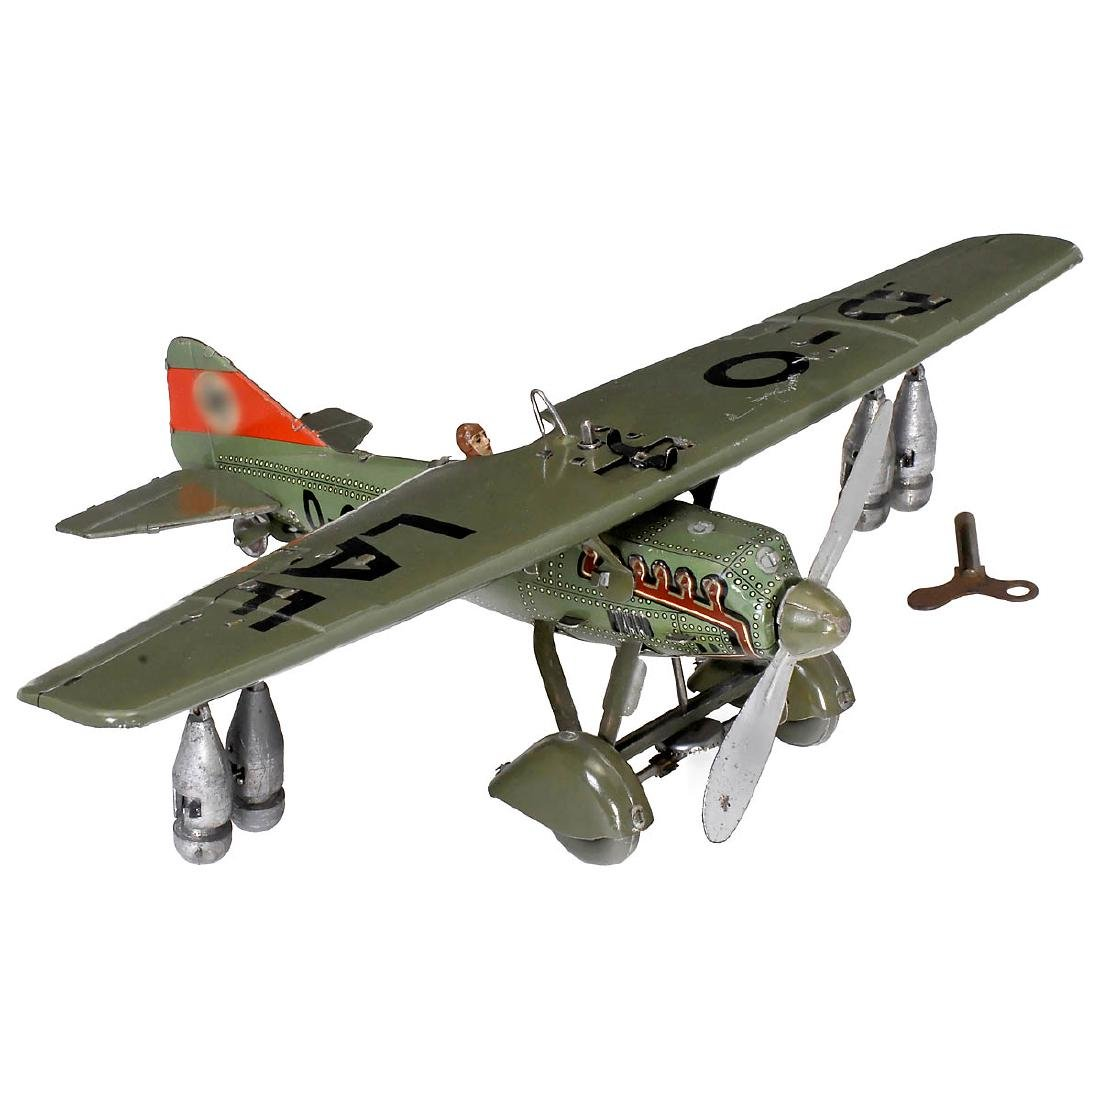 Tippco D-Olaf Bomber Airplane, c. 1938